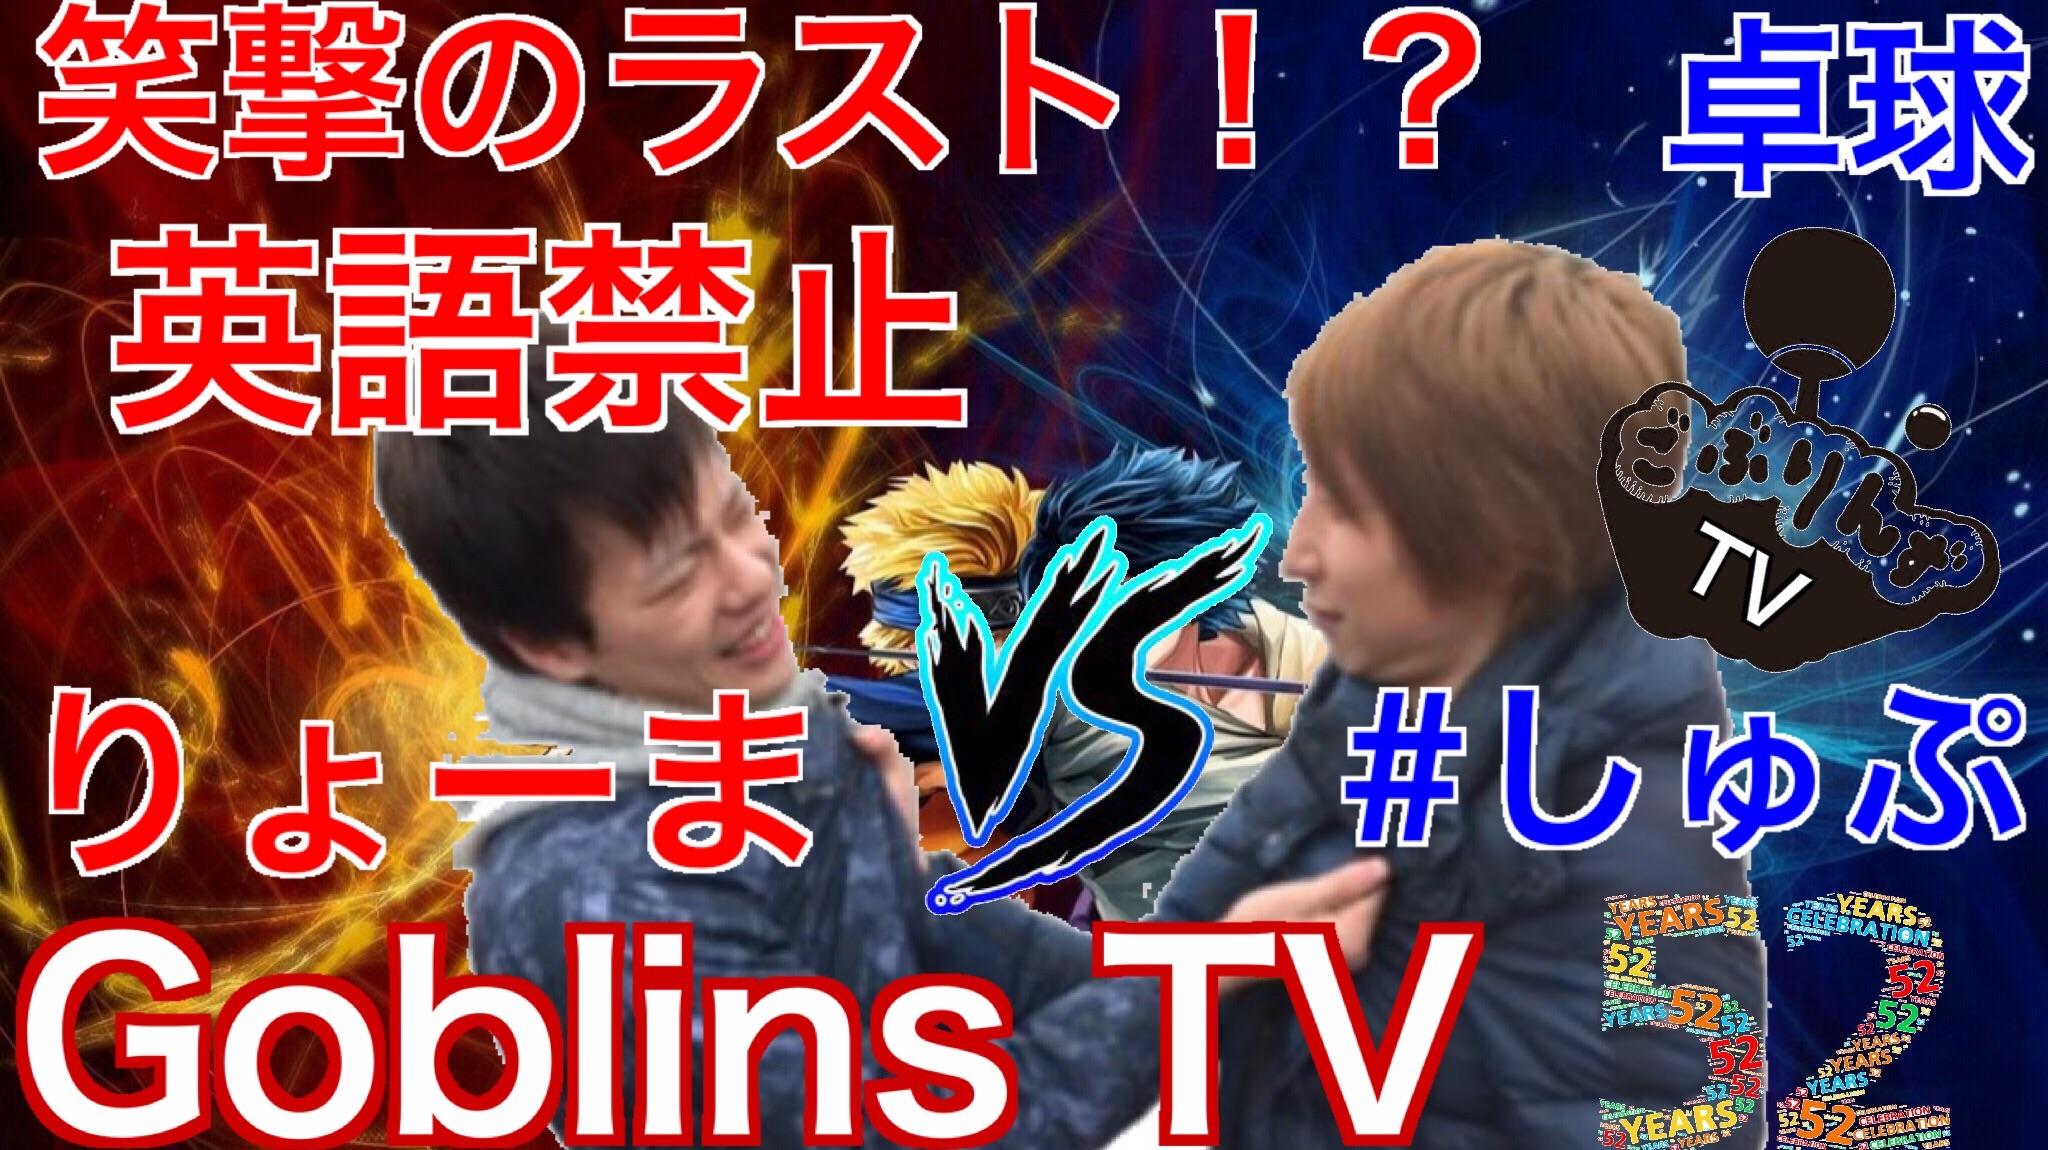 f:id:GoblinsTV:20190328111448j:image